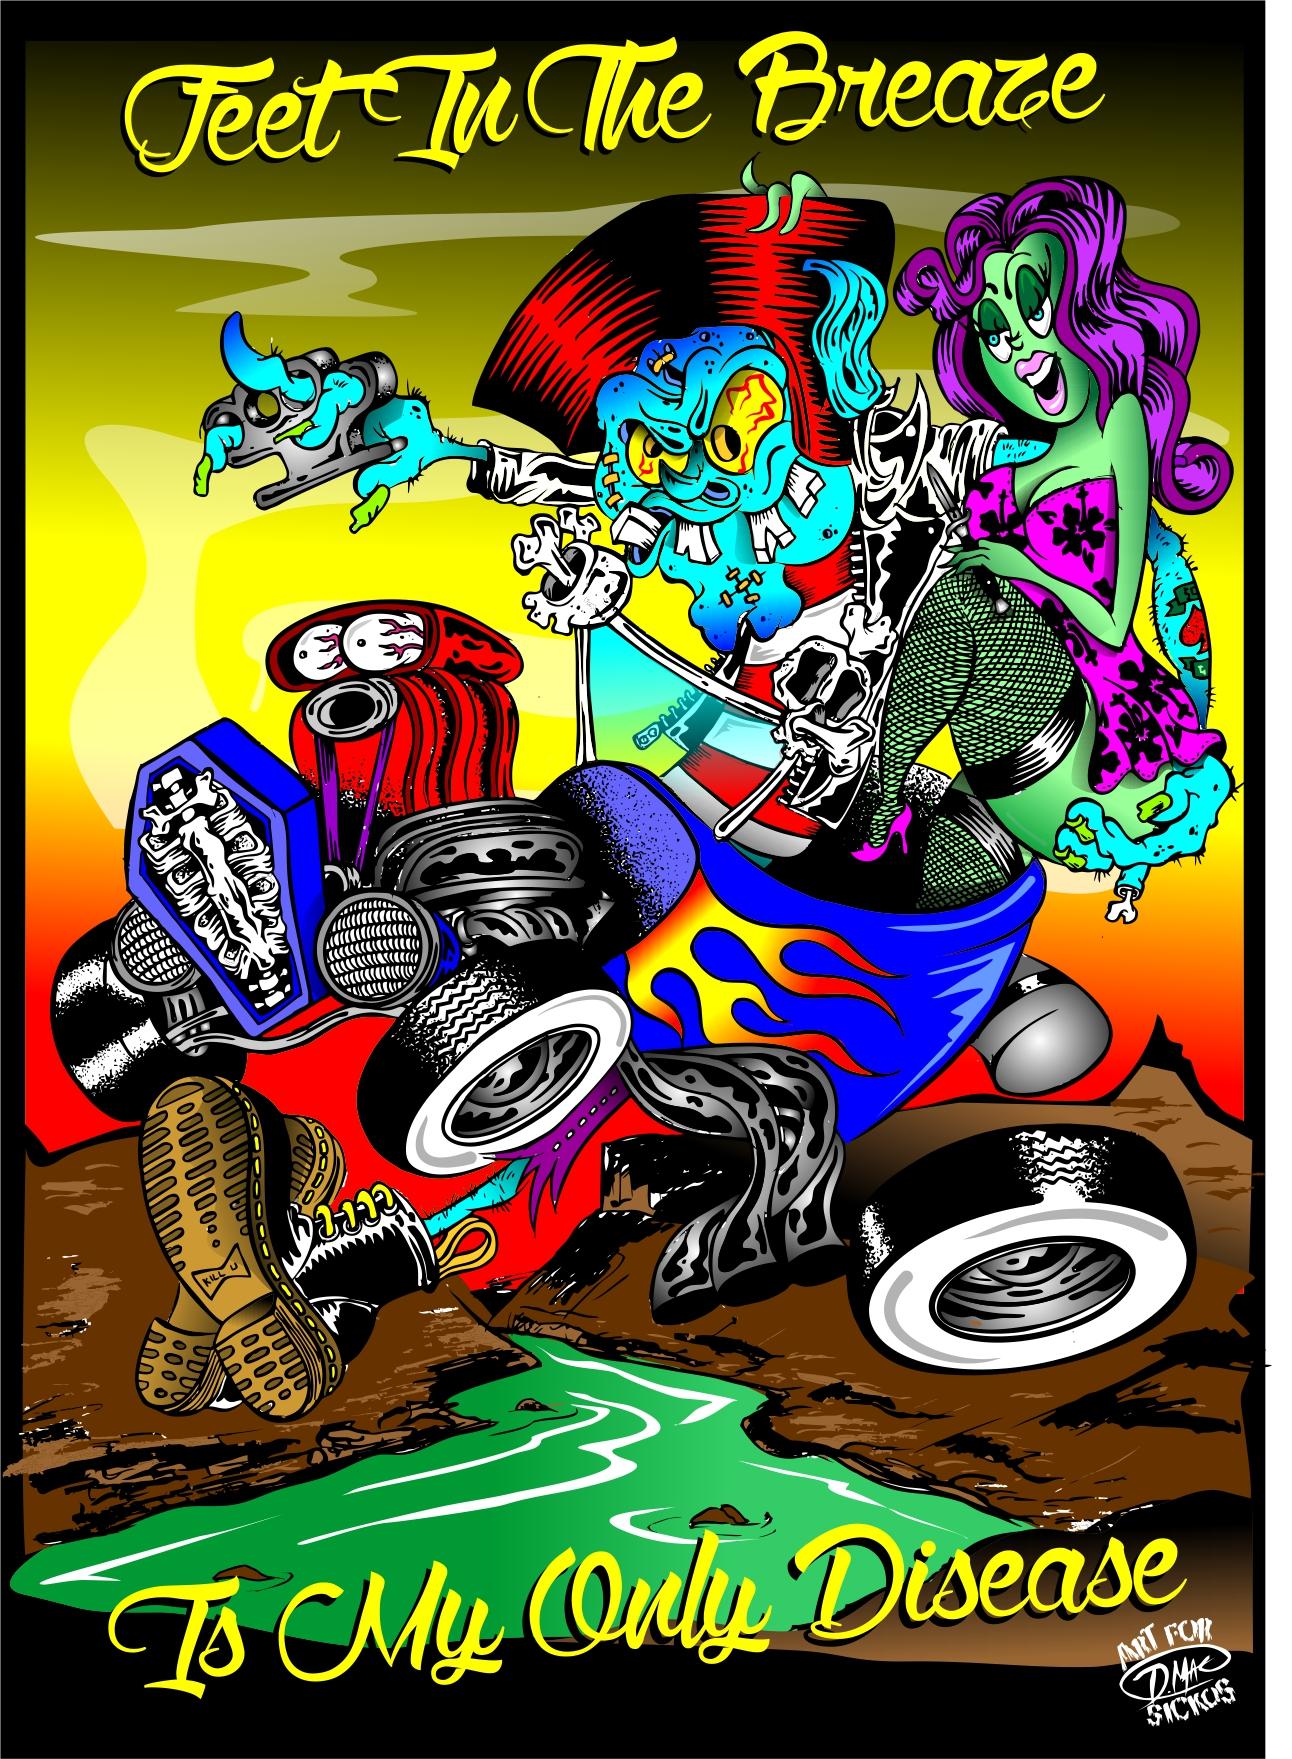 Mags  Bands  Doug Mac Art  Illustrations  Lowbrow Art  Illustrator  Tshirt art  Hot Rod